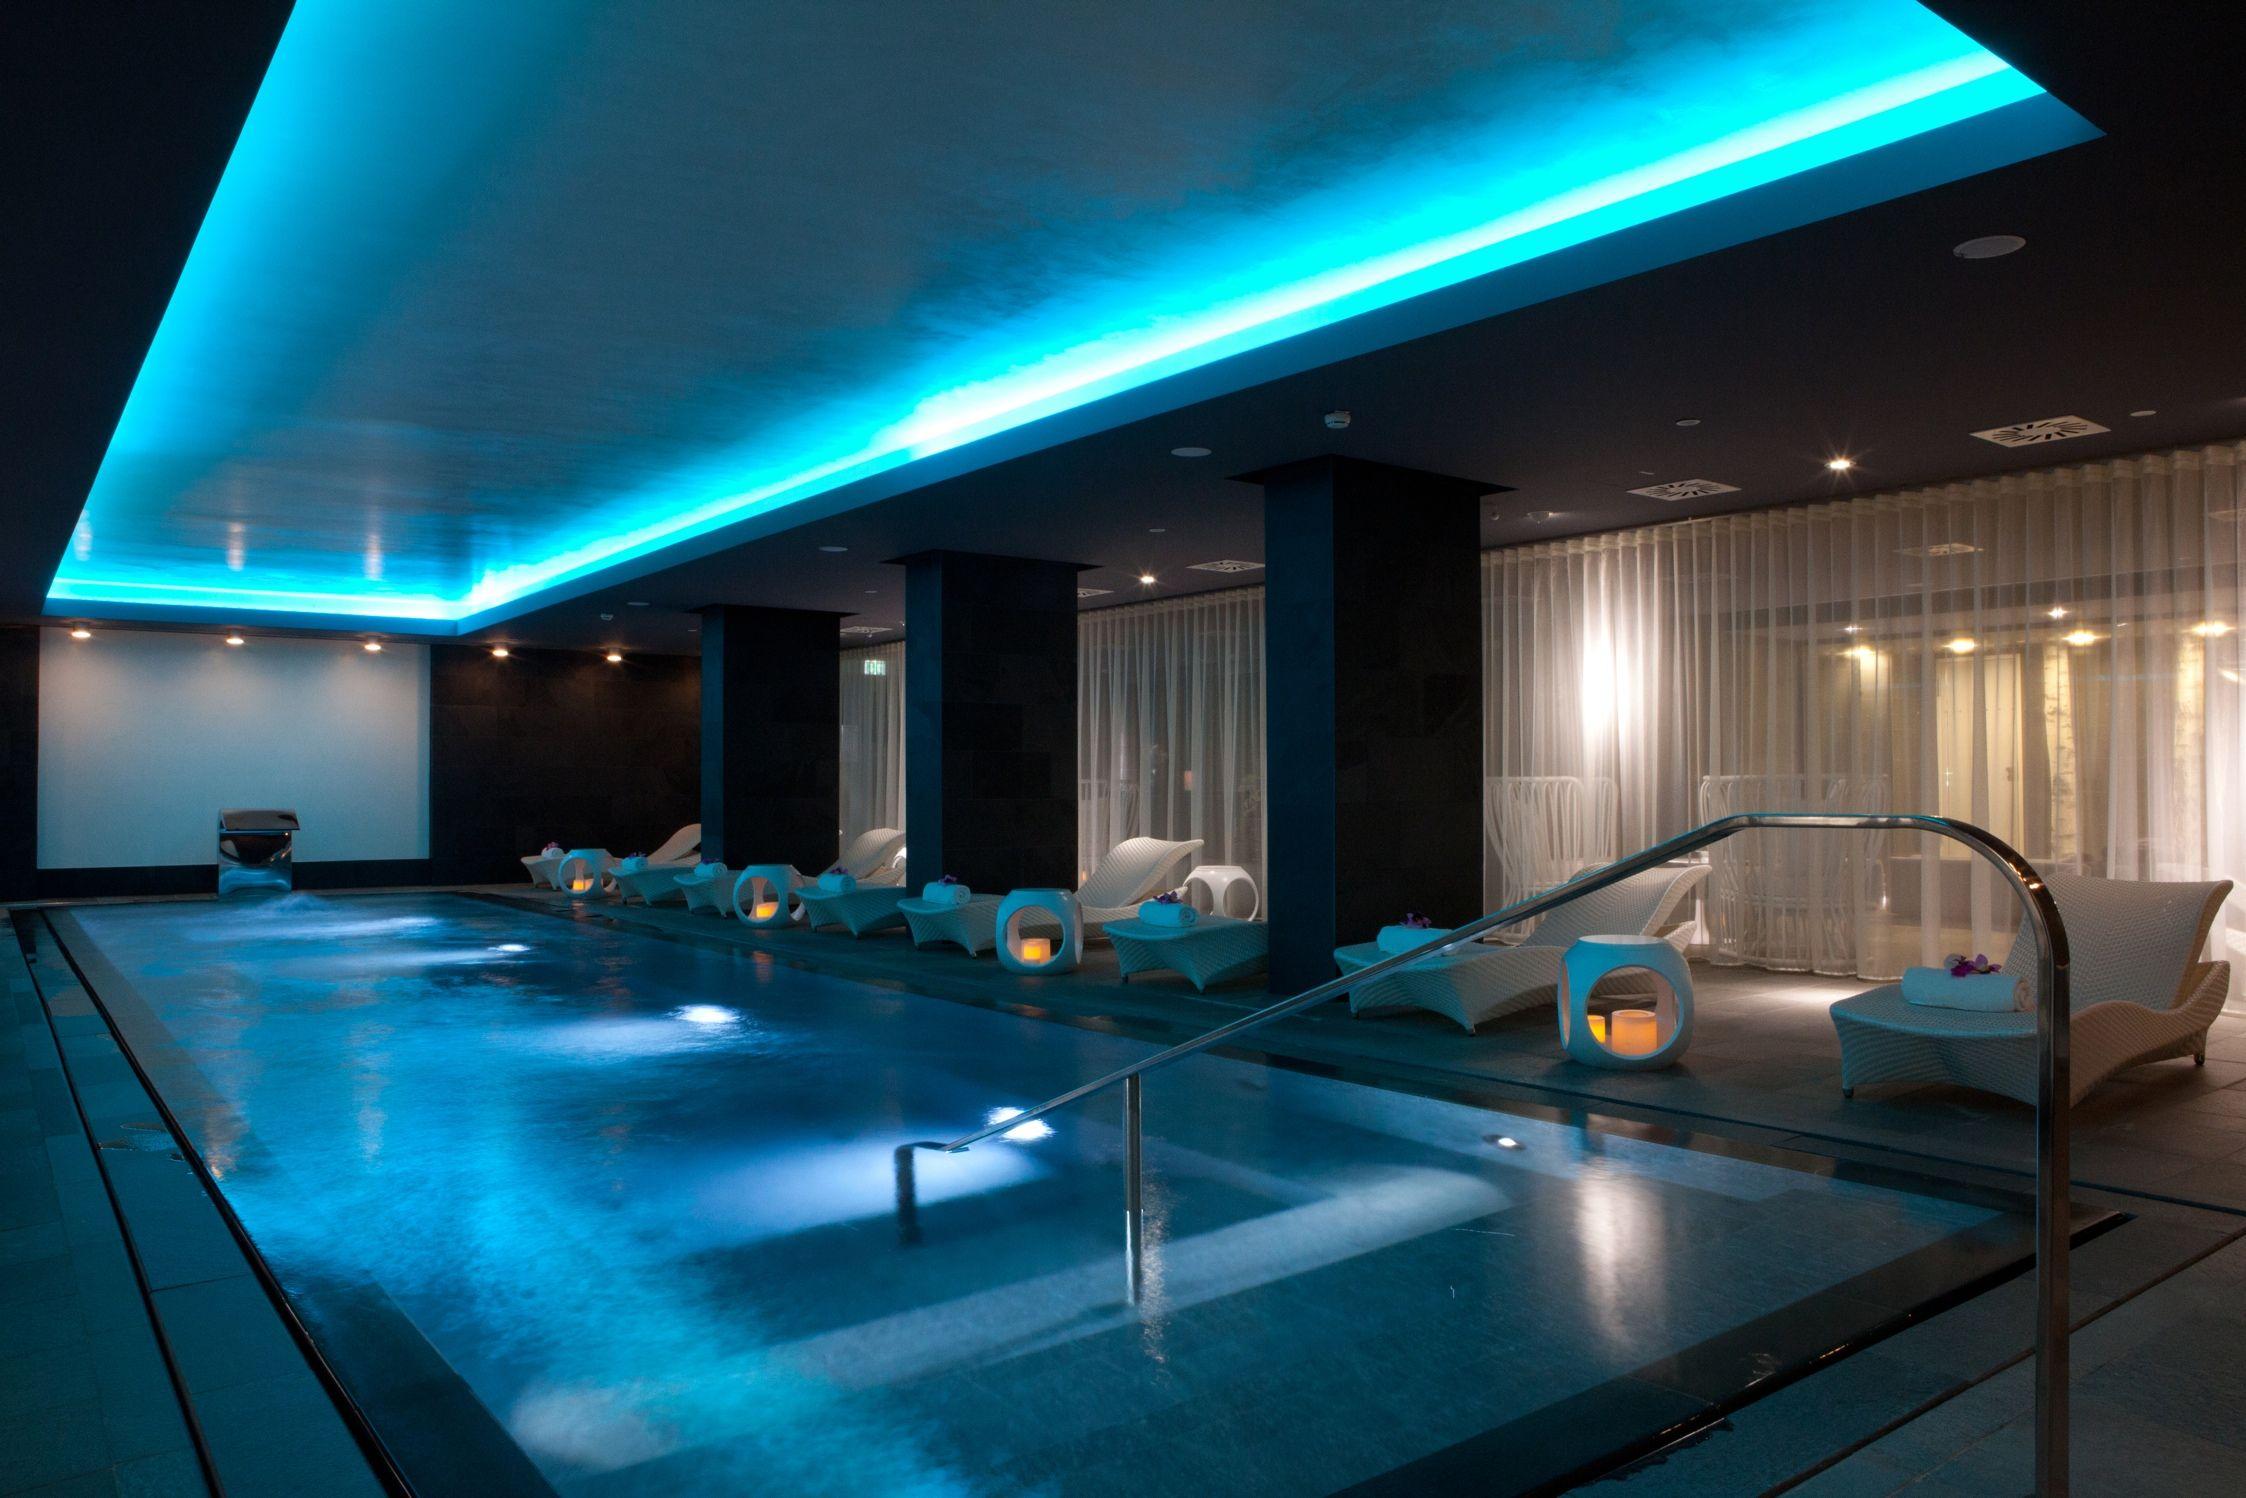 Holmes place - vitality pool | SPA | Pinterest